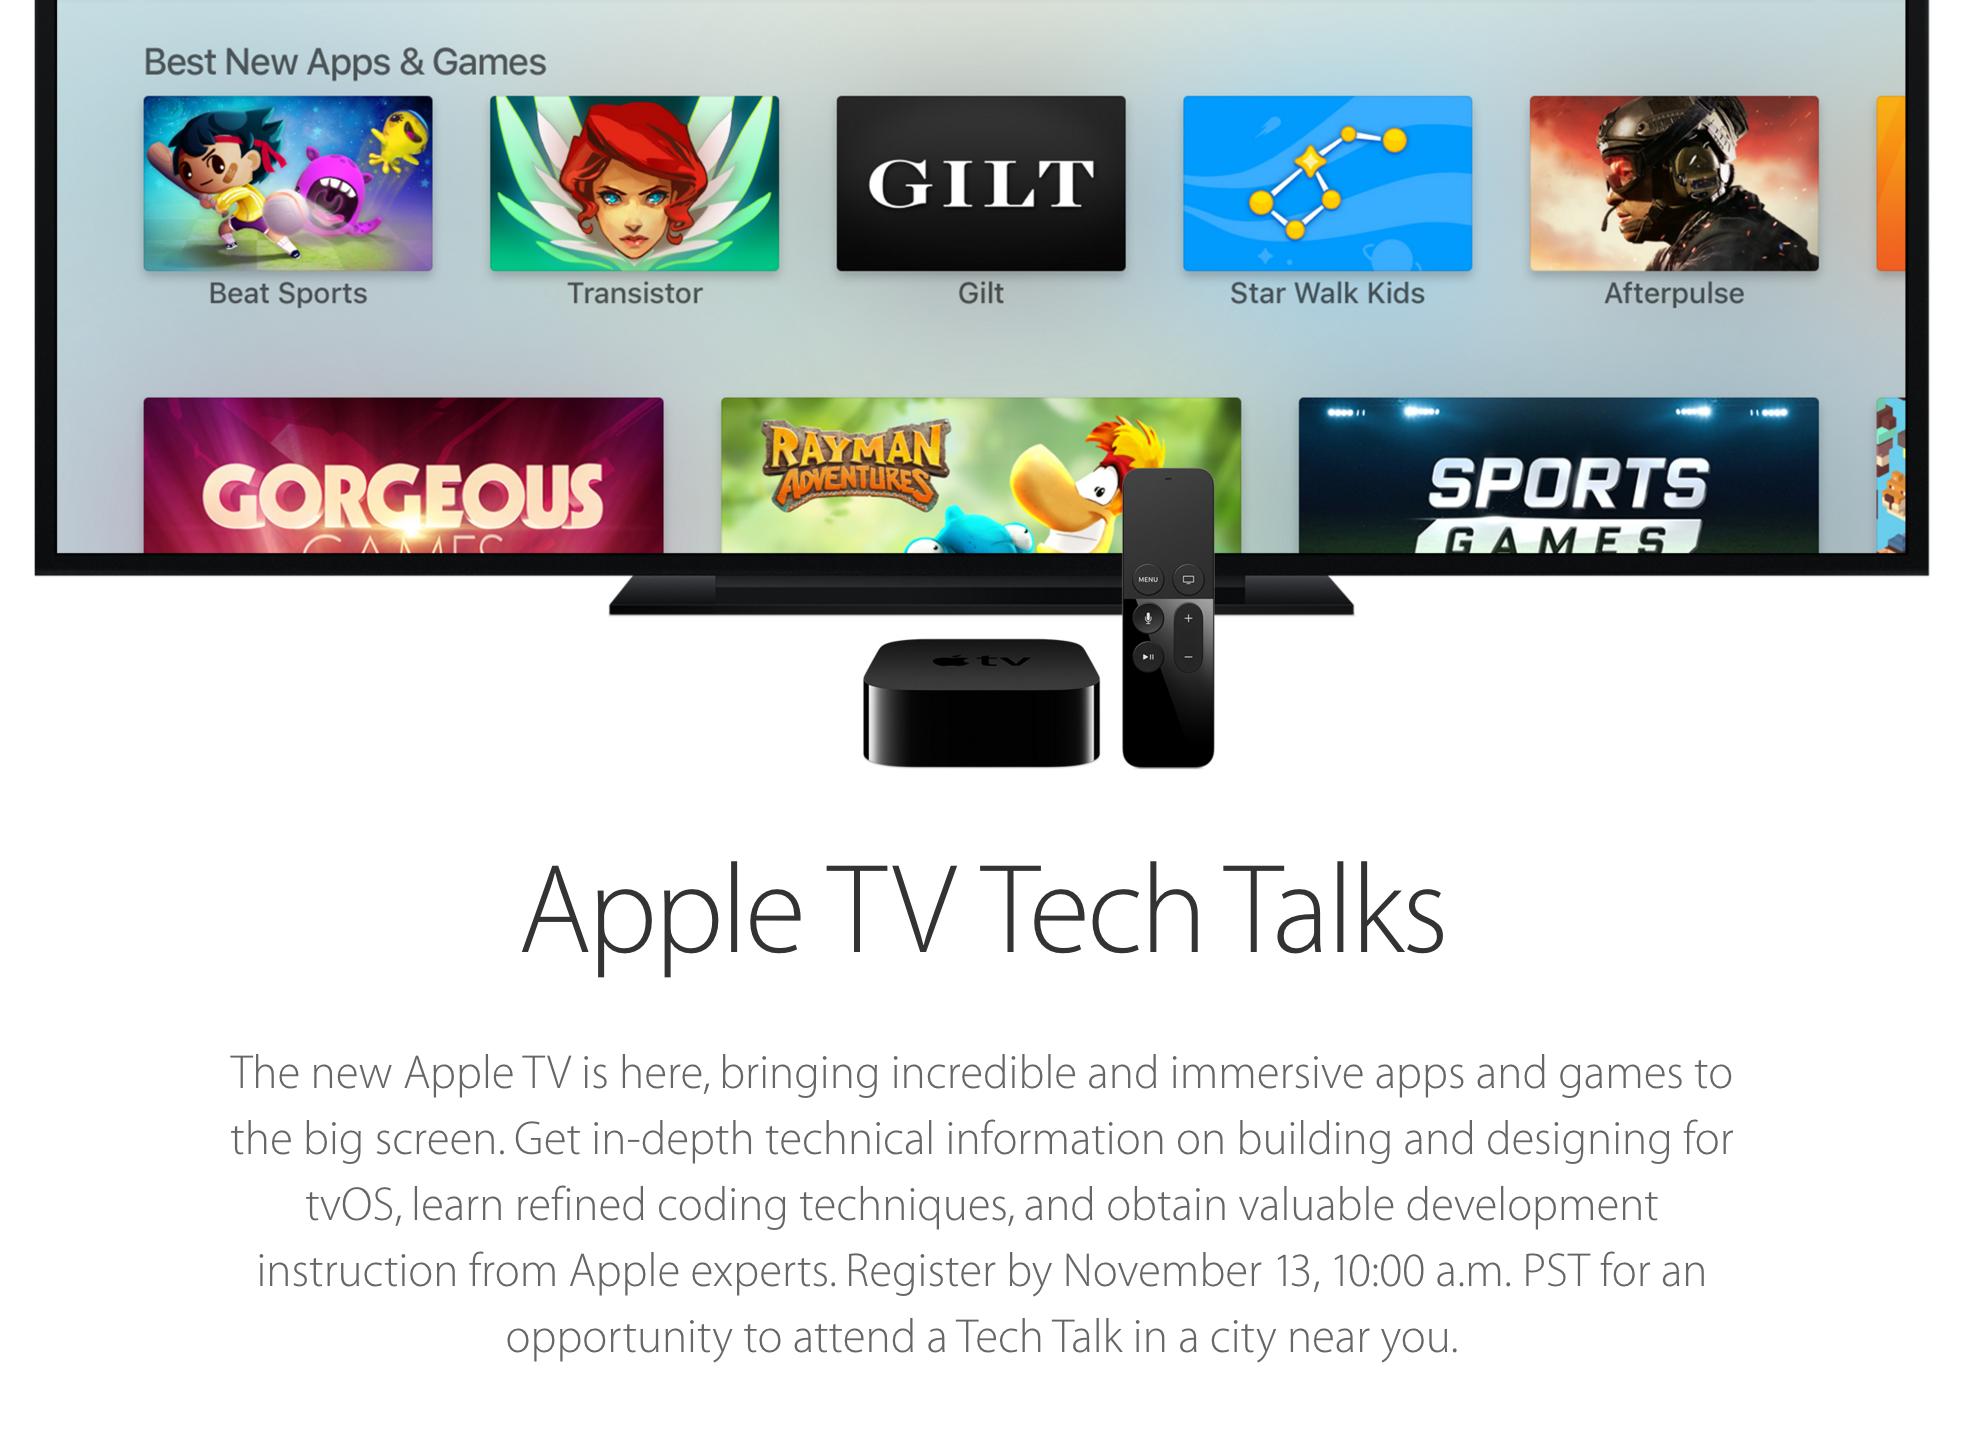 Apple, 개발자를 위한 Apple TV Tech Talks. 세계 10개 도시에서 개최.